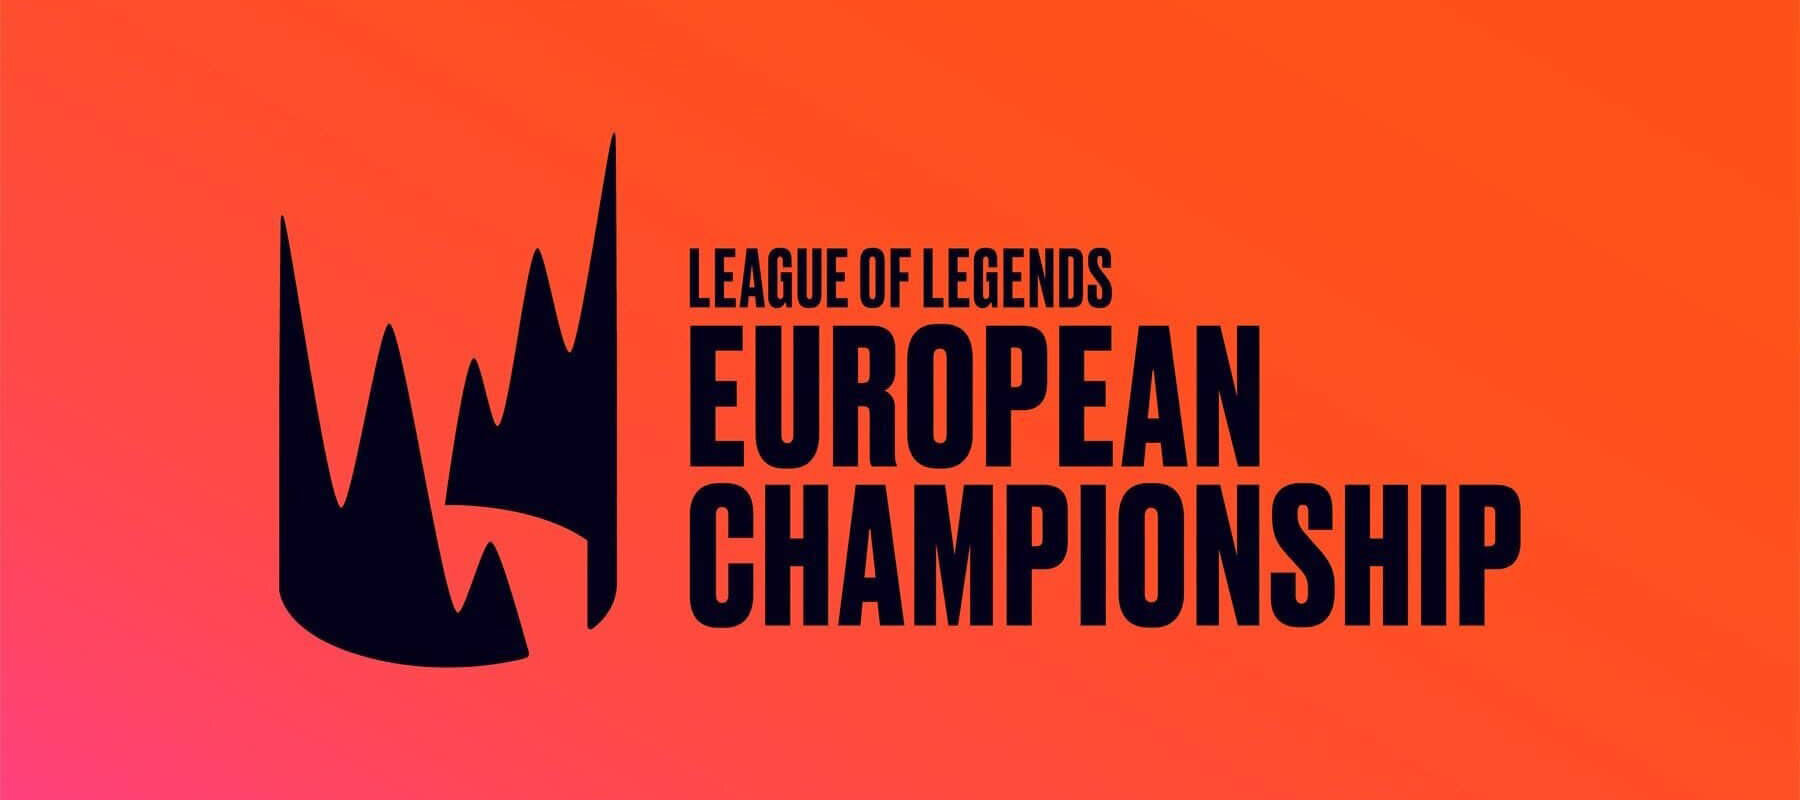 eSports Betting: League of Legends LEC June 14th Matches